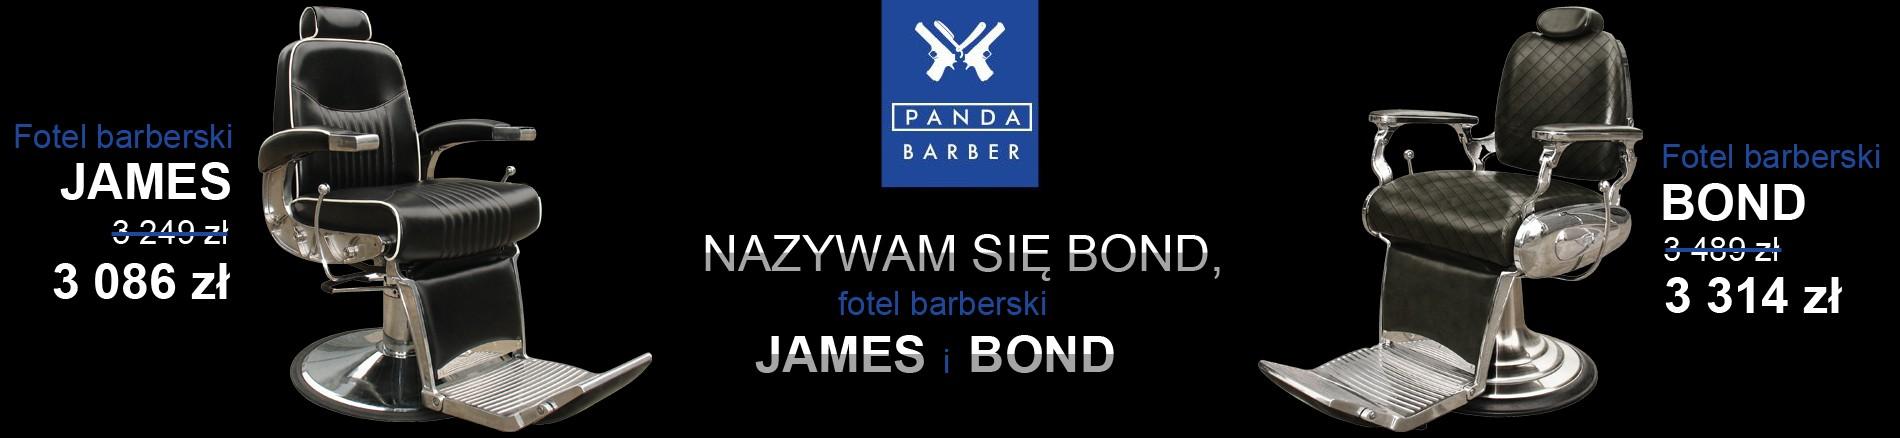 Fotele barberskie James i Bond